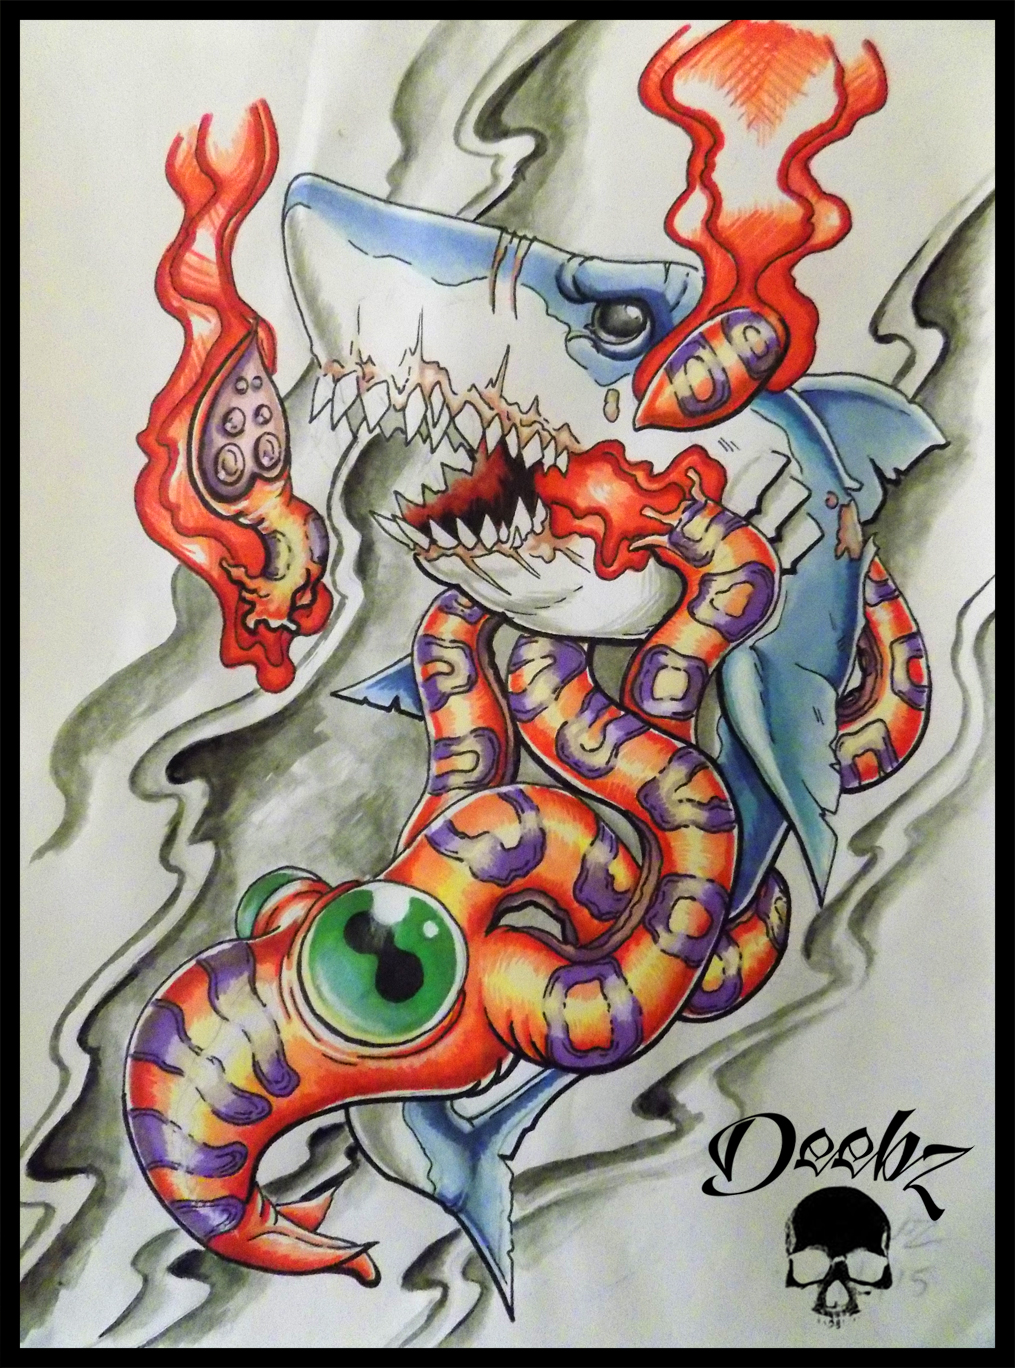 Squid Shark By Deebz Design On Deviantart